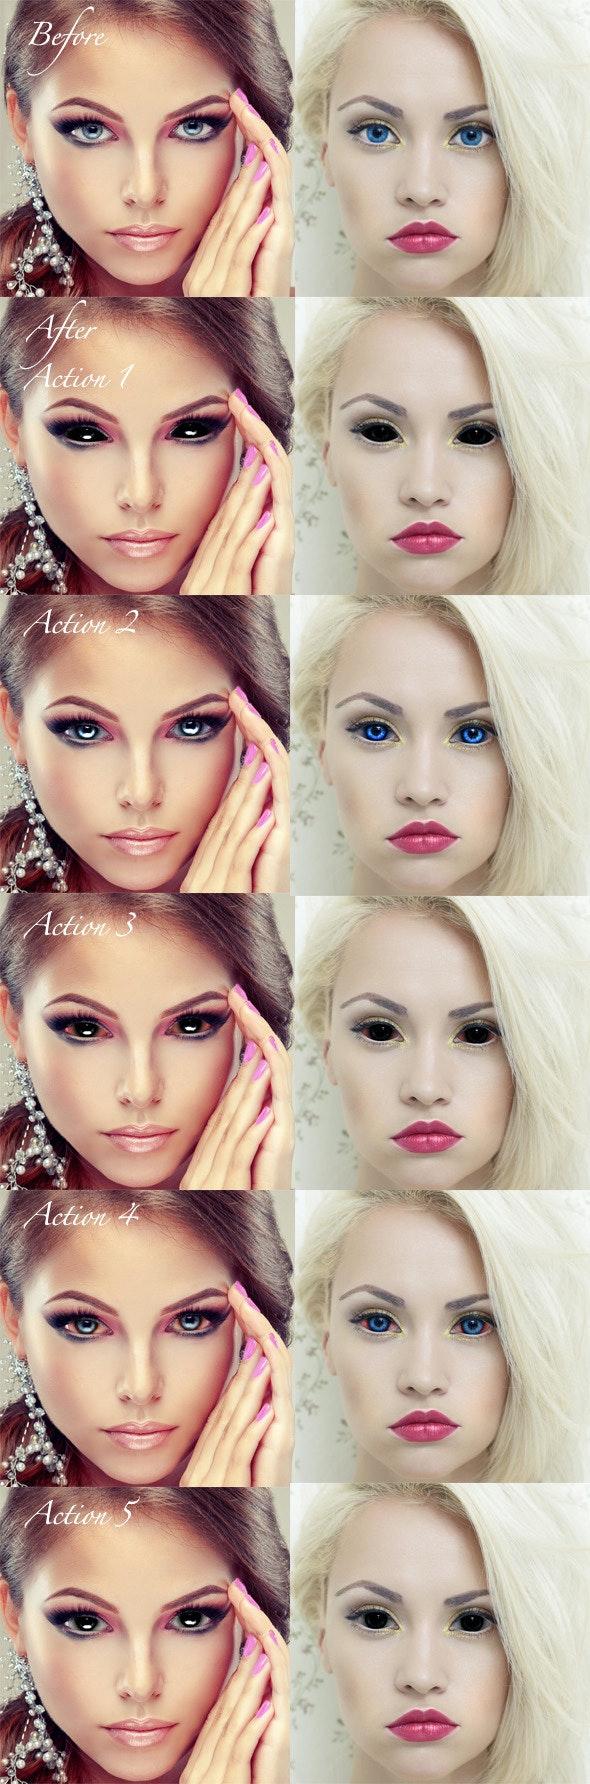 Creepy Eyes - Actions Photoshop